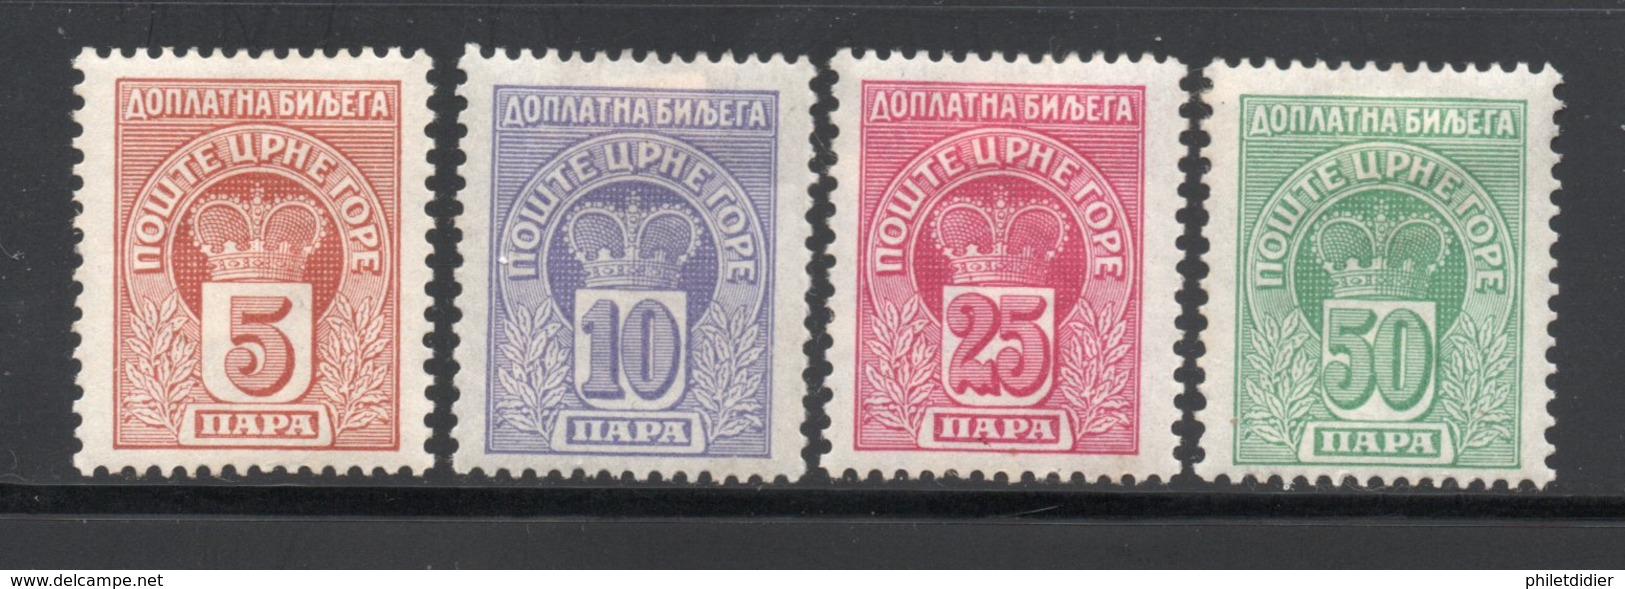 Royaume MONTENEGRO Timbres Taxes N° 20 à 23 - Montenegro